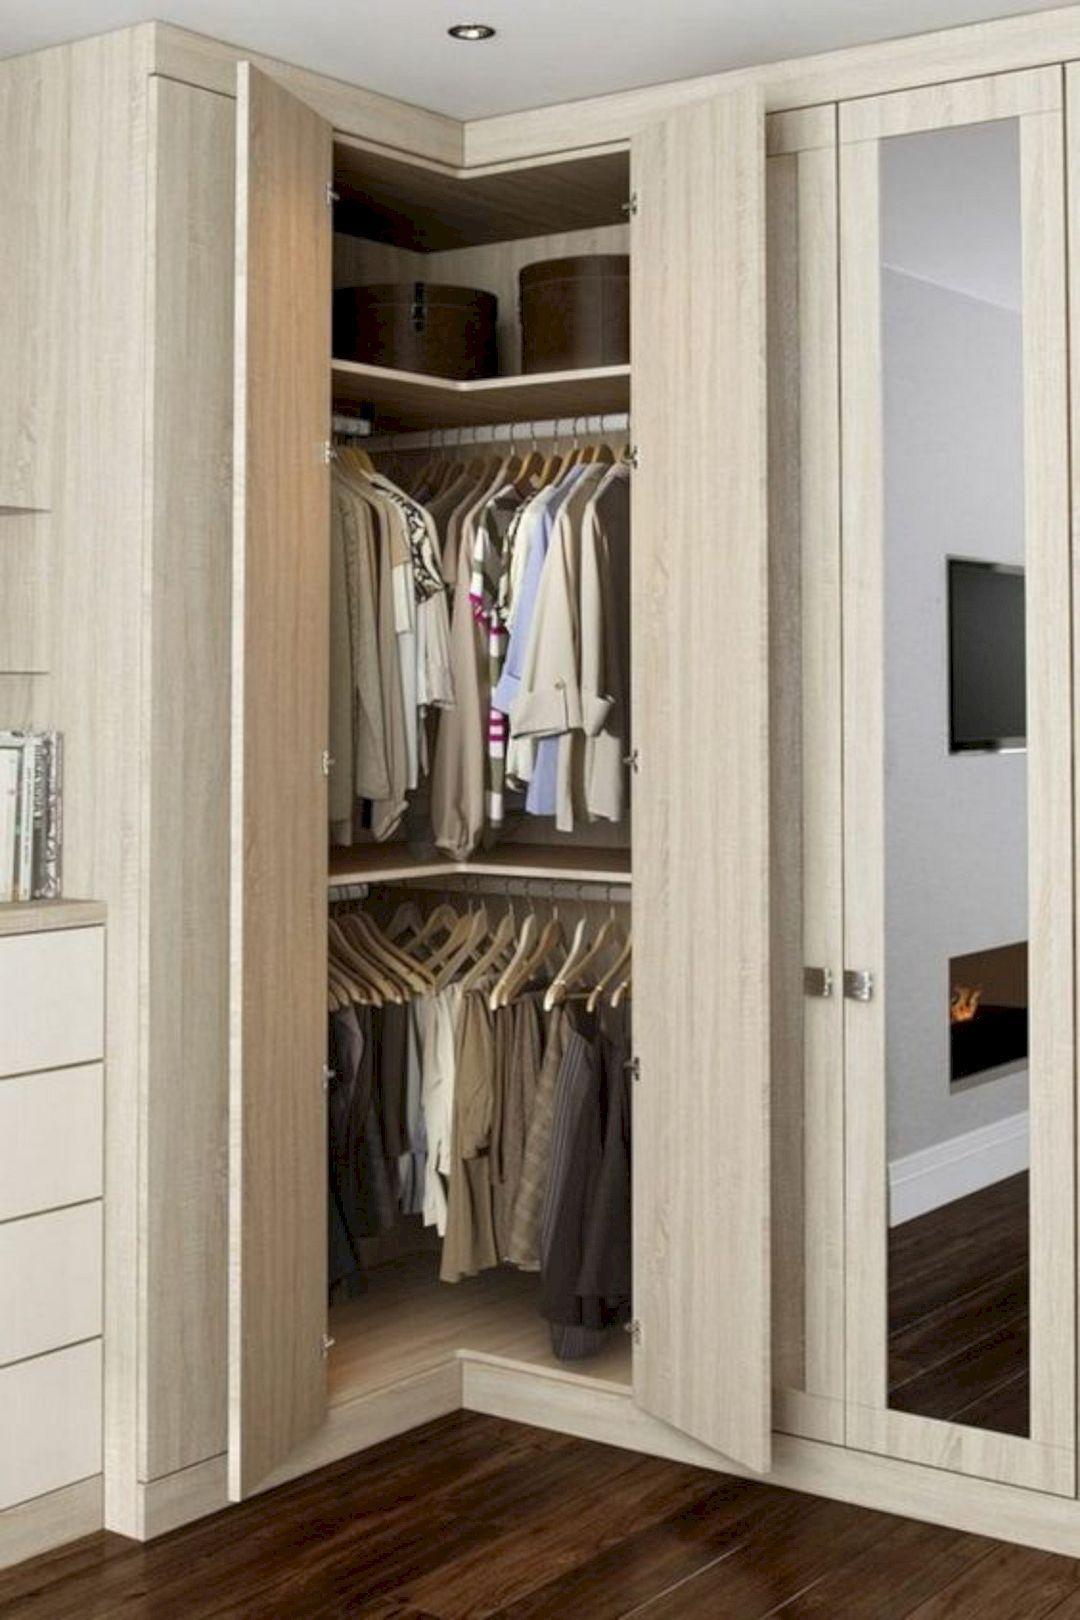 44++ Ideas for corner space in bedroom cpns 2021